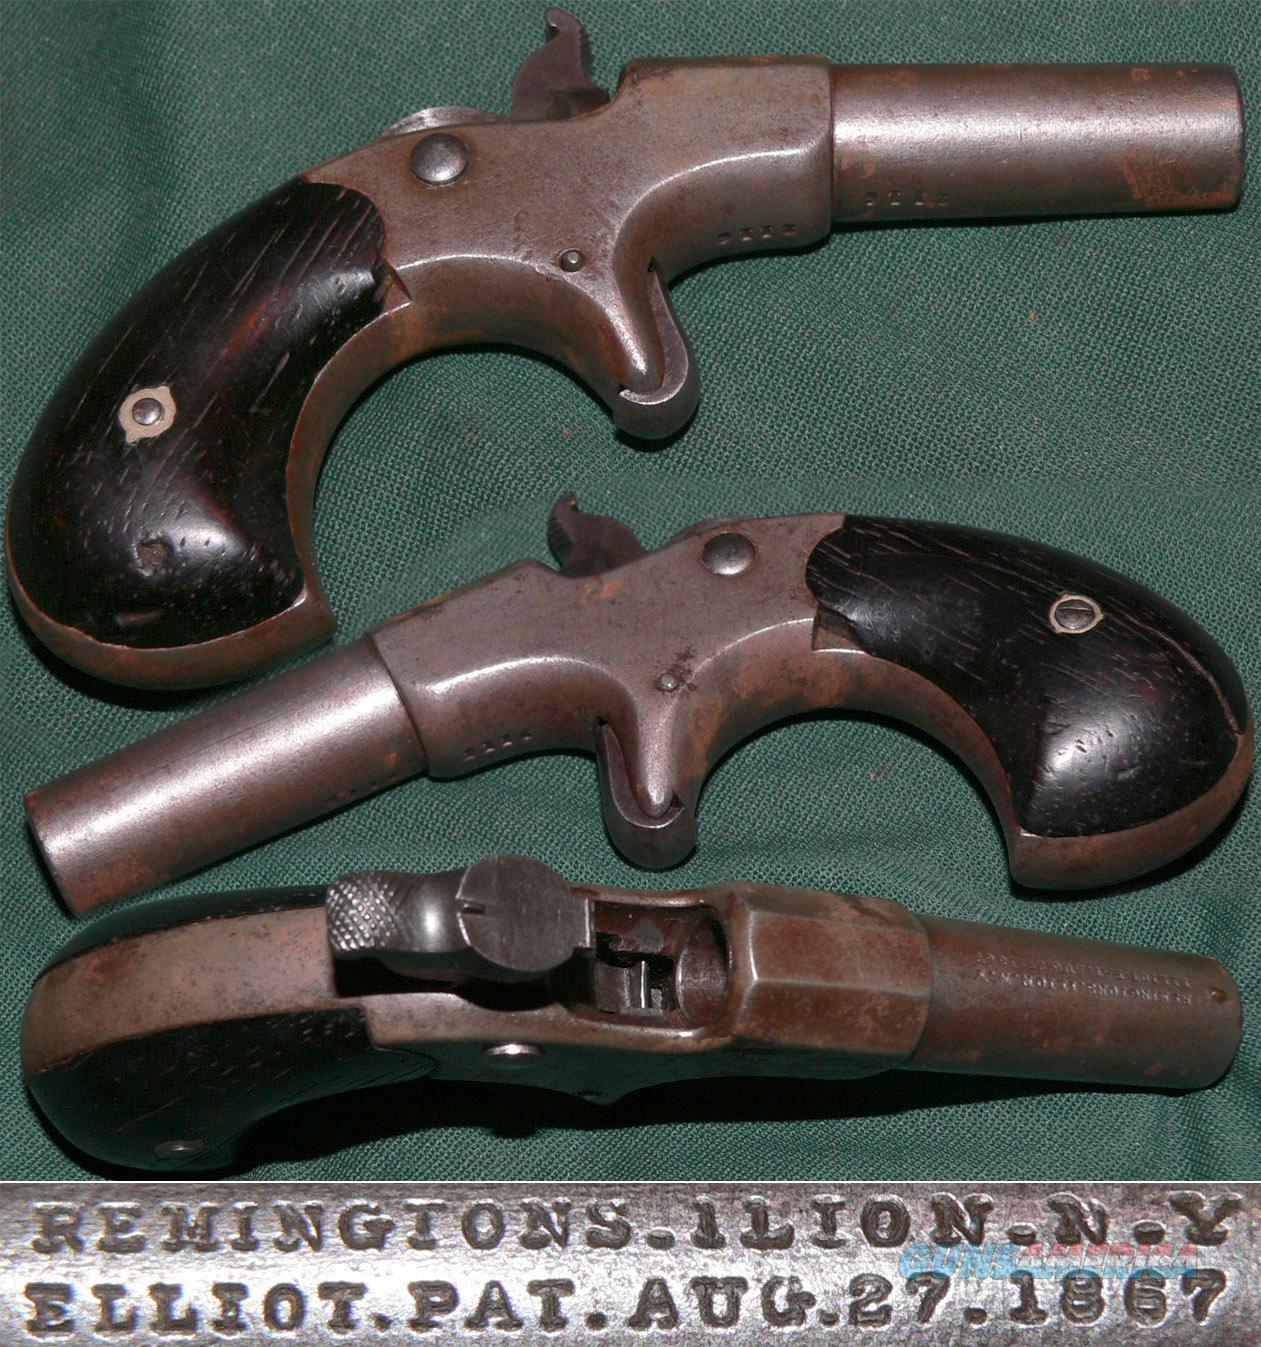 Remington Elliot single shot 41 rimfire derringer  Guns > Pistols > Remington Pistols - Pre-1899